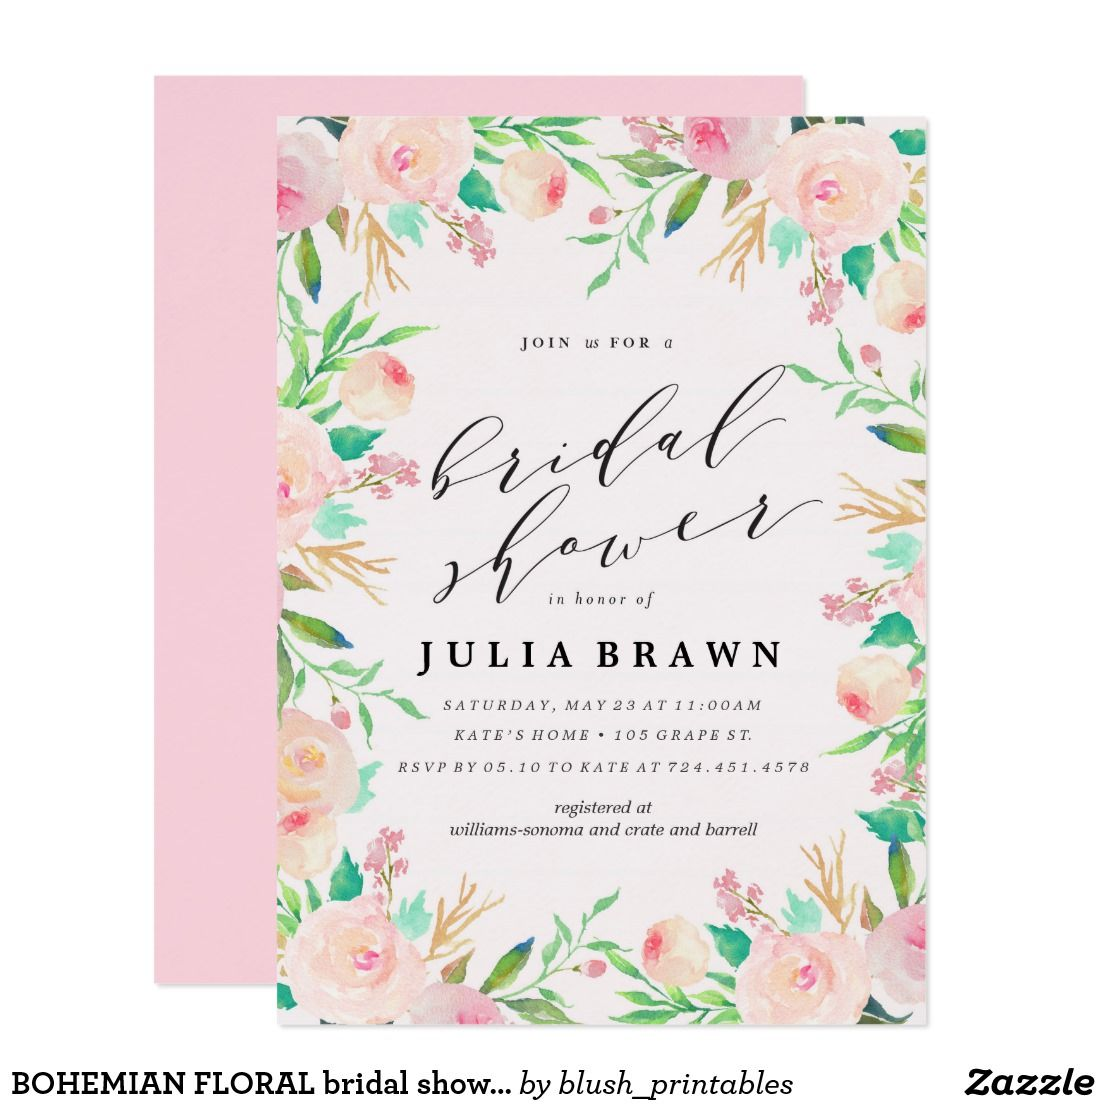 Bohemian floral bridal shower invitation bridal shower invitations bohemian floral bridal shower invitation filmwisefo